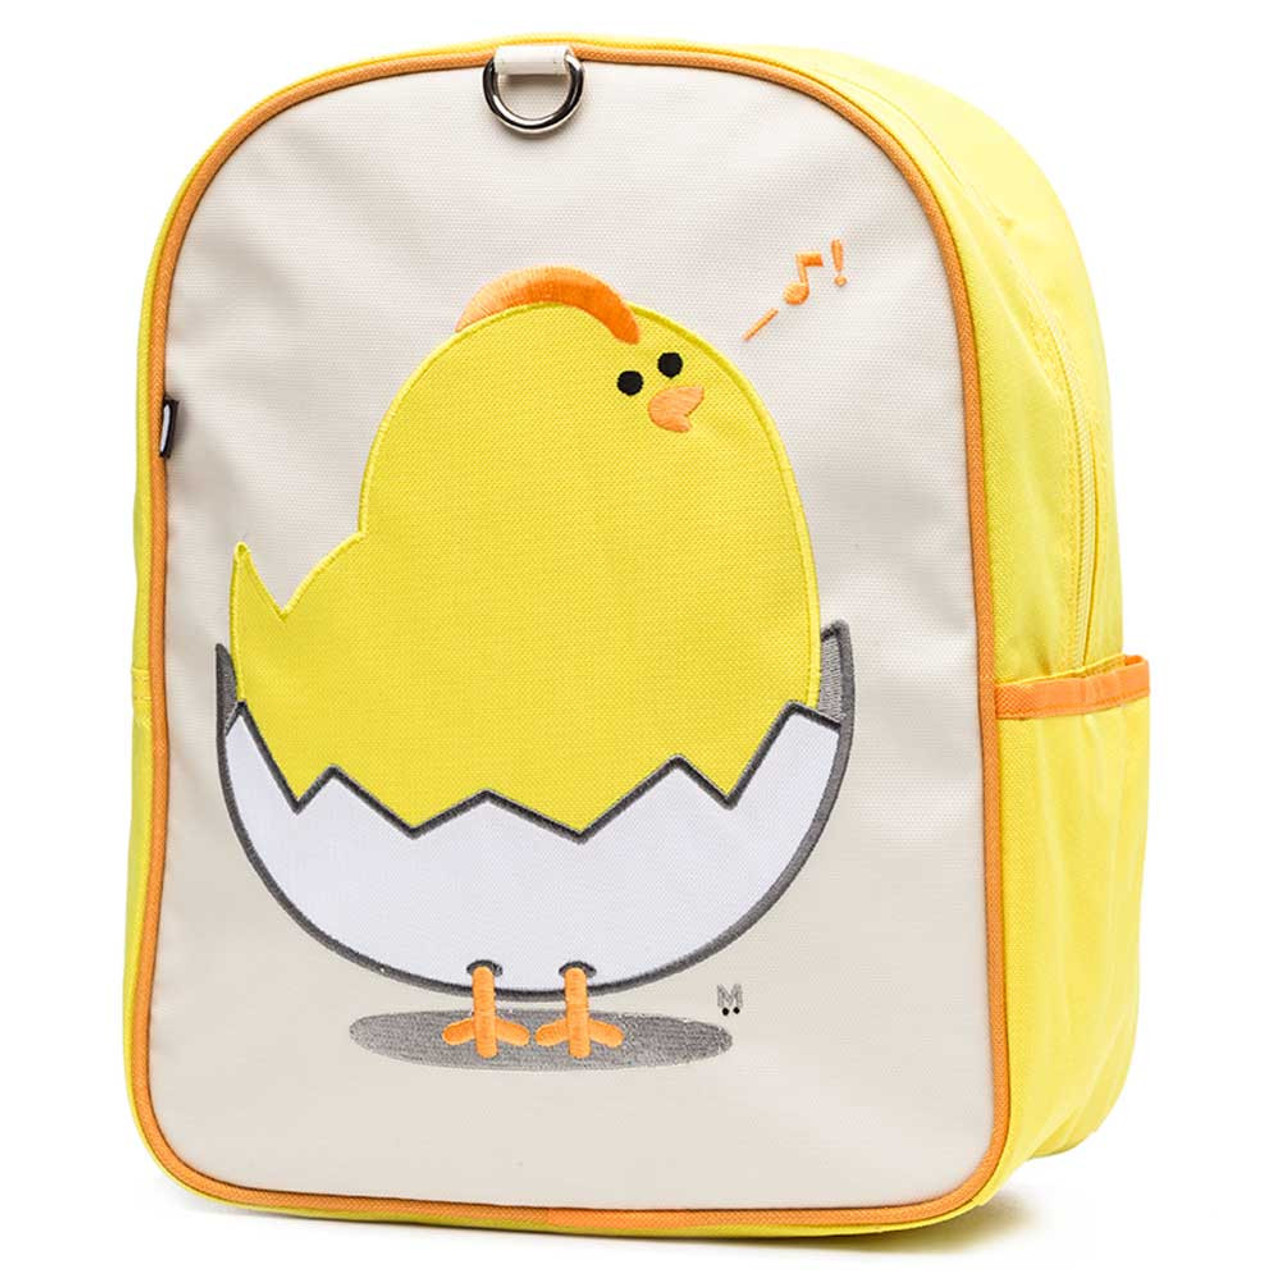 24294f8a017c Toddler Backpacks - Beatrix New York - Kiki Chick Little Kid Backpack